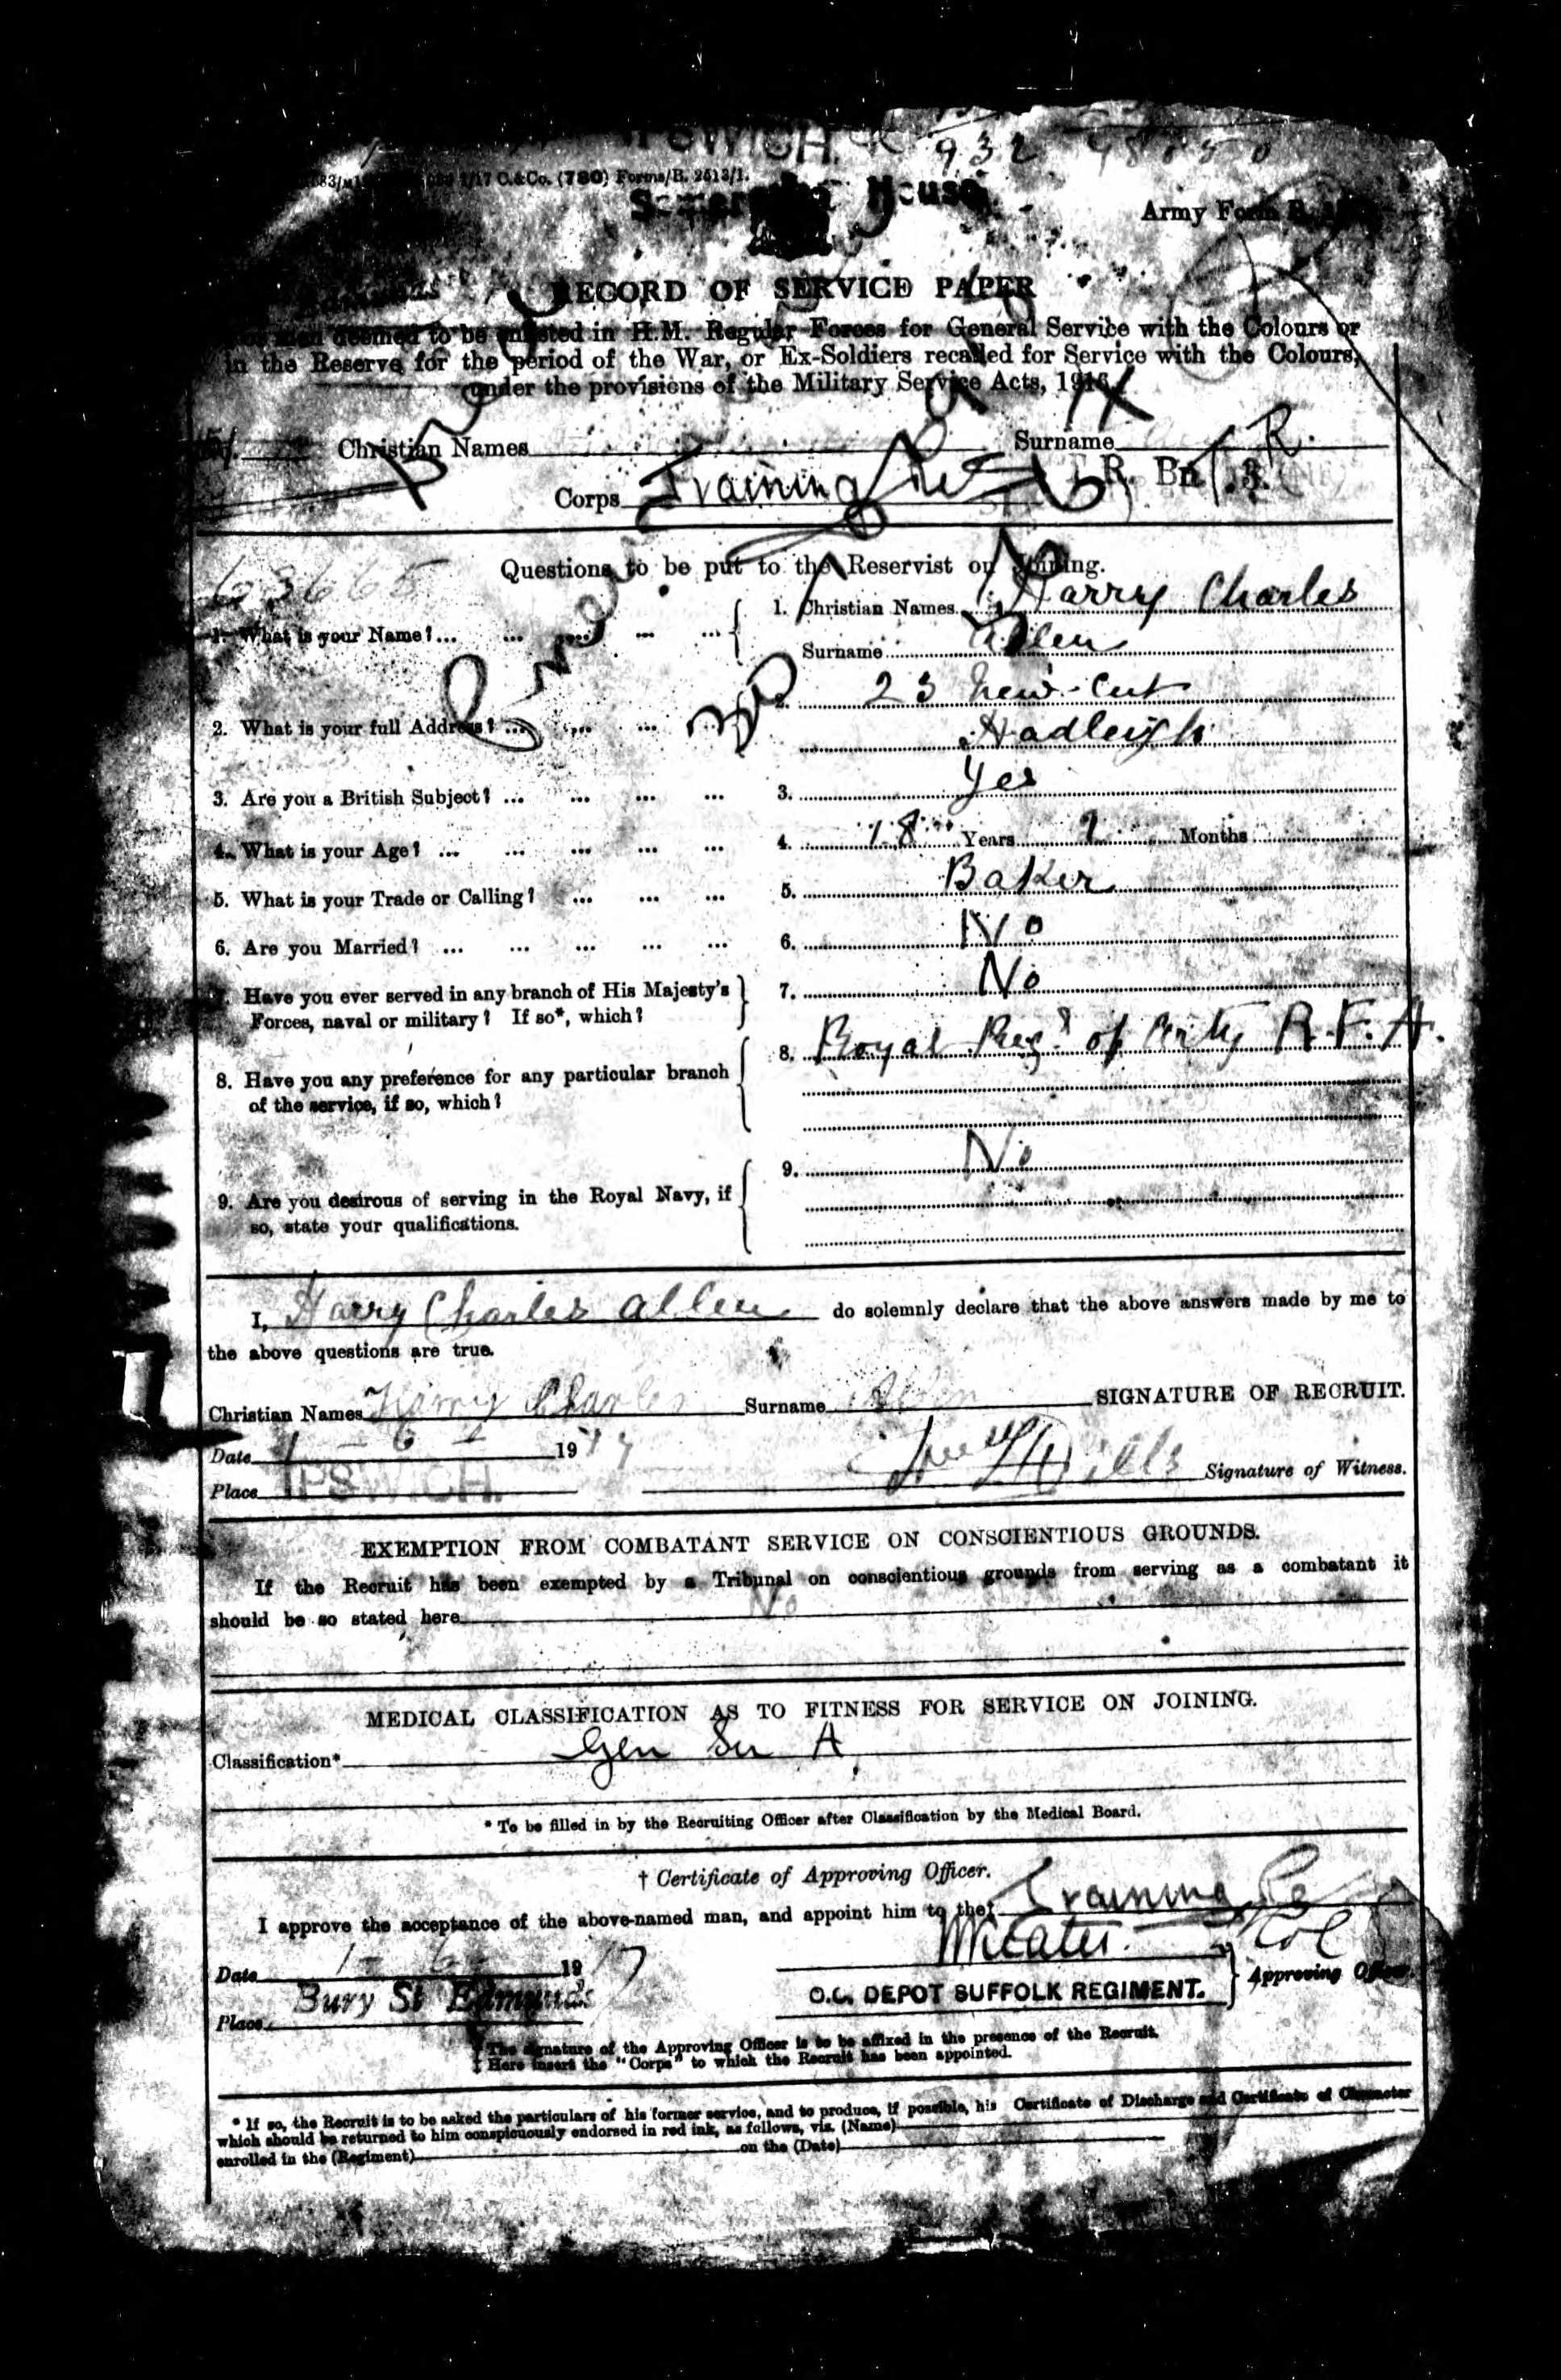 Harry Charles Allen service record 1.jpg